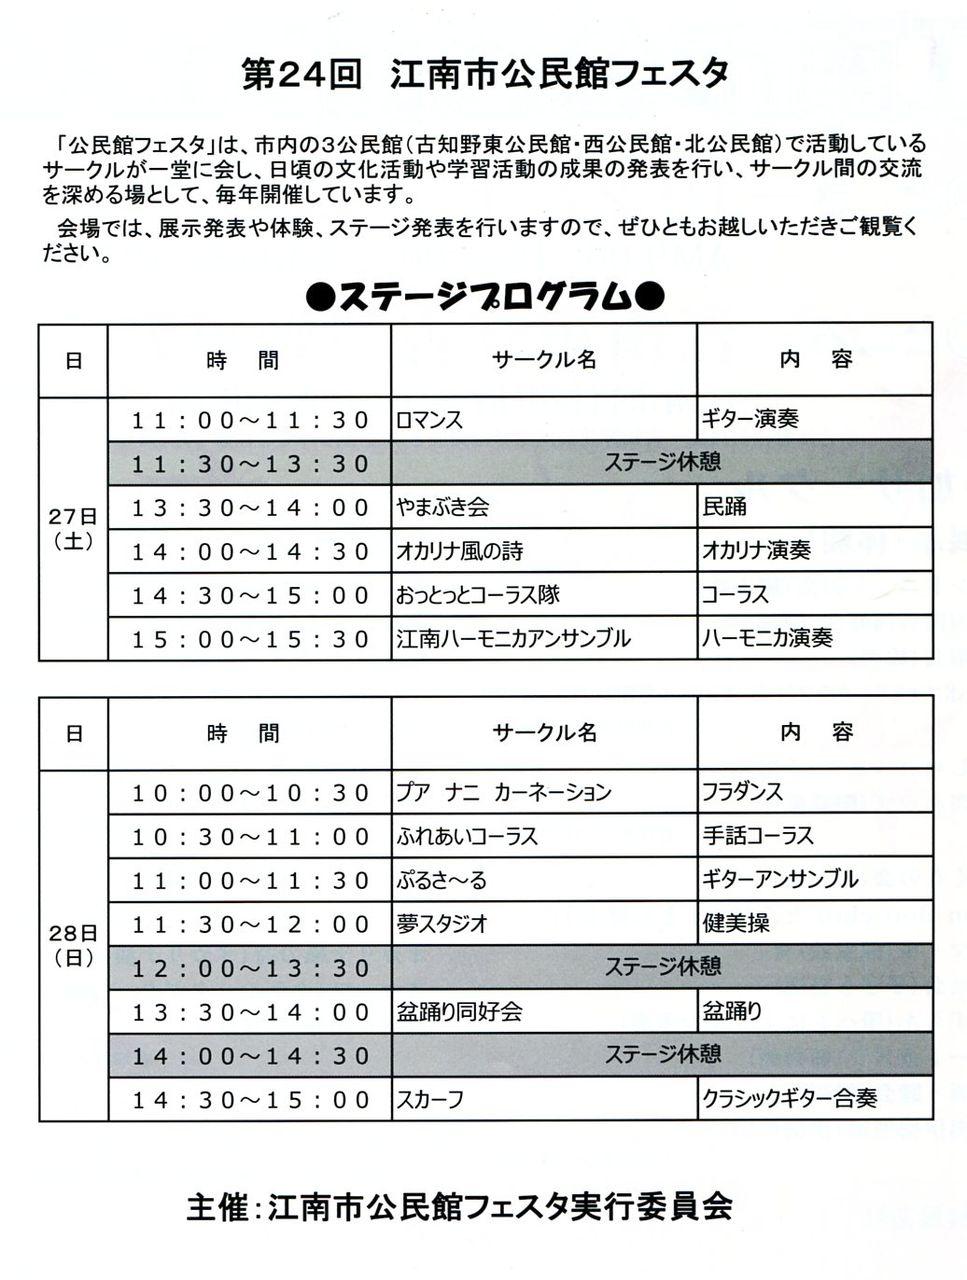 『第24回江南市公民館フェスタ』10/27(土)・28(日)